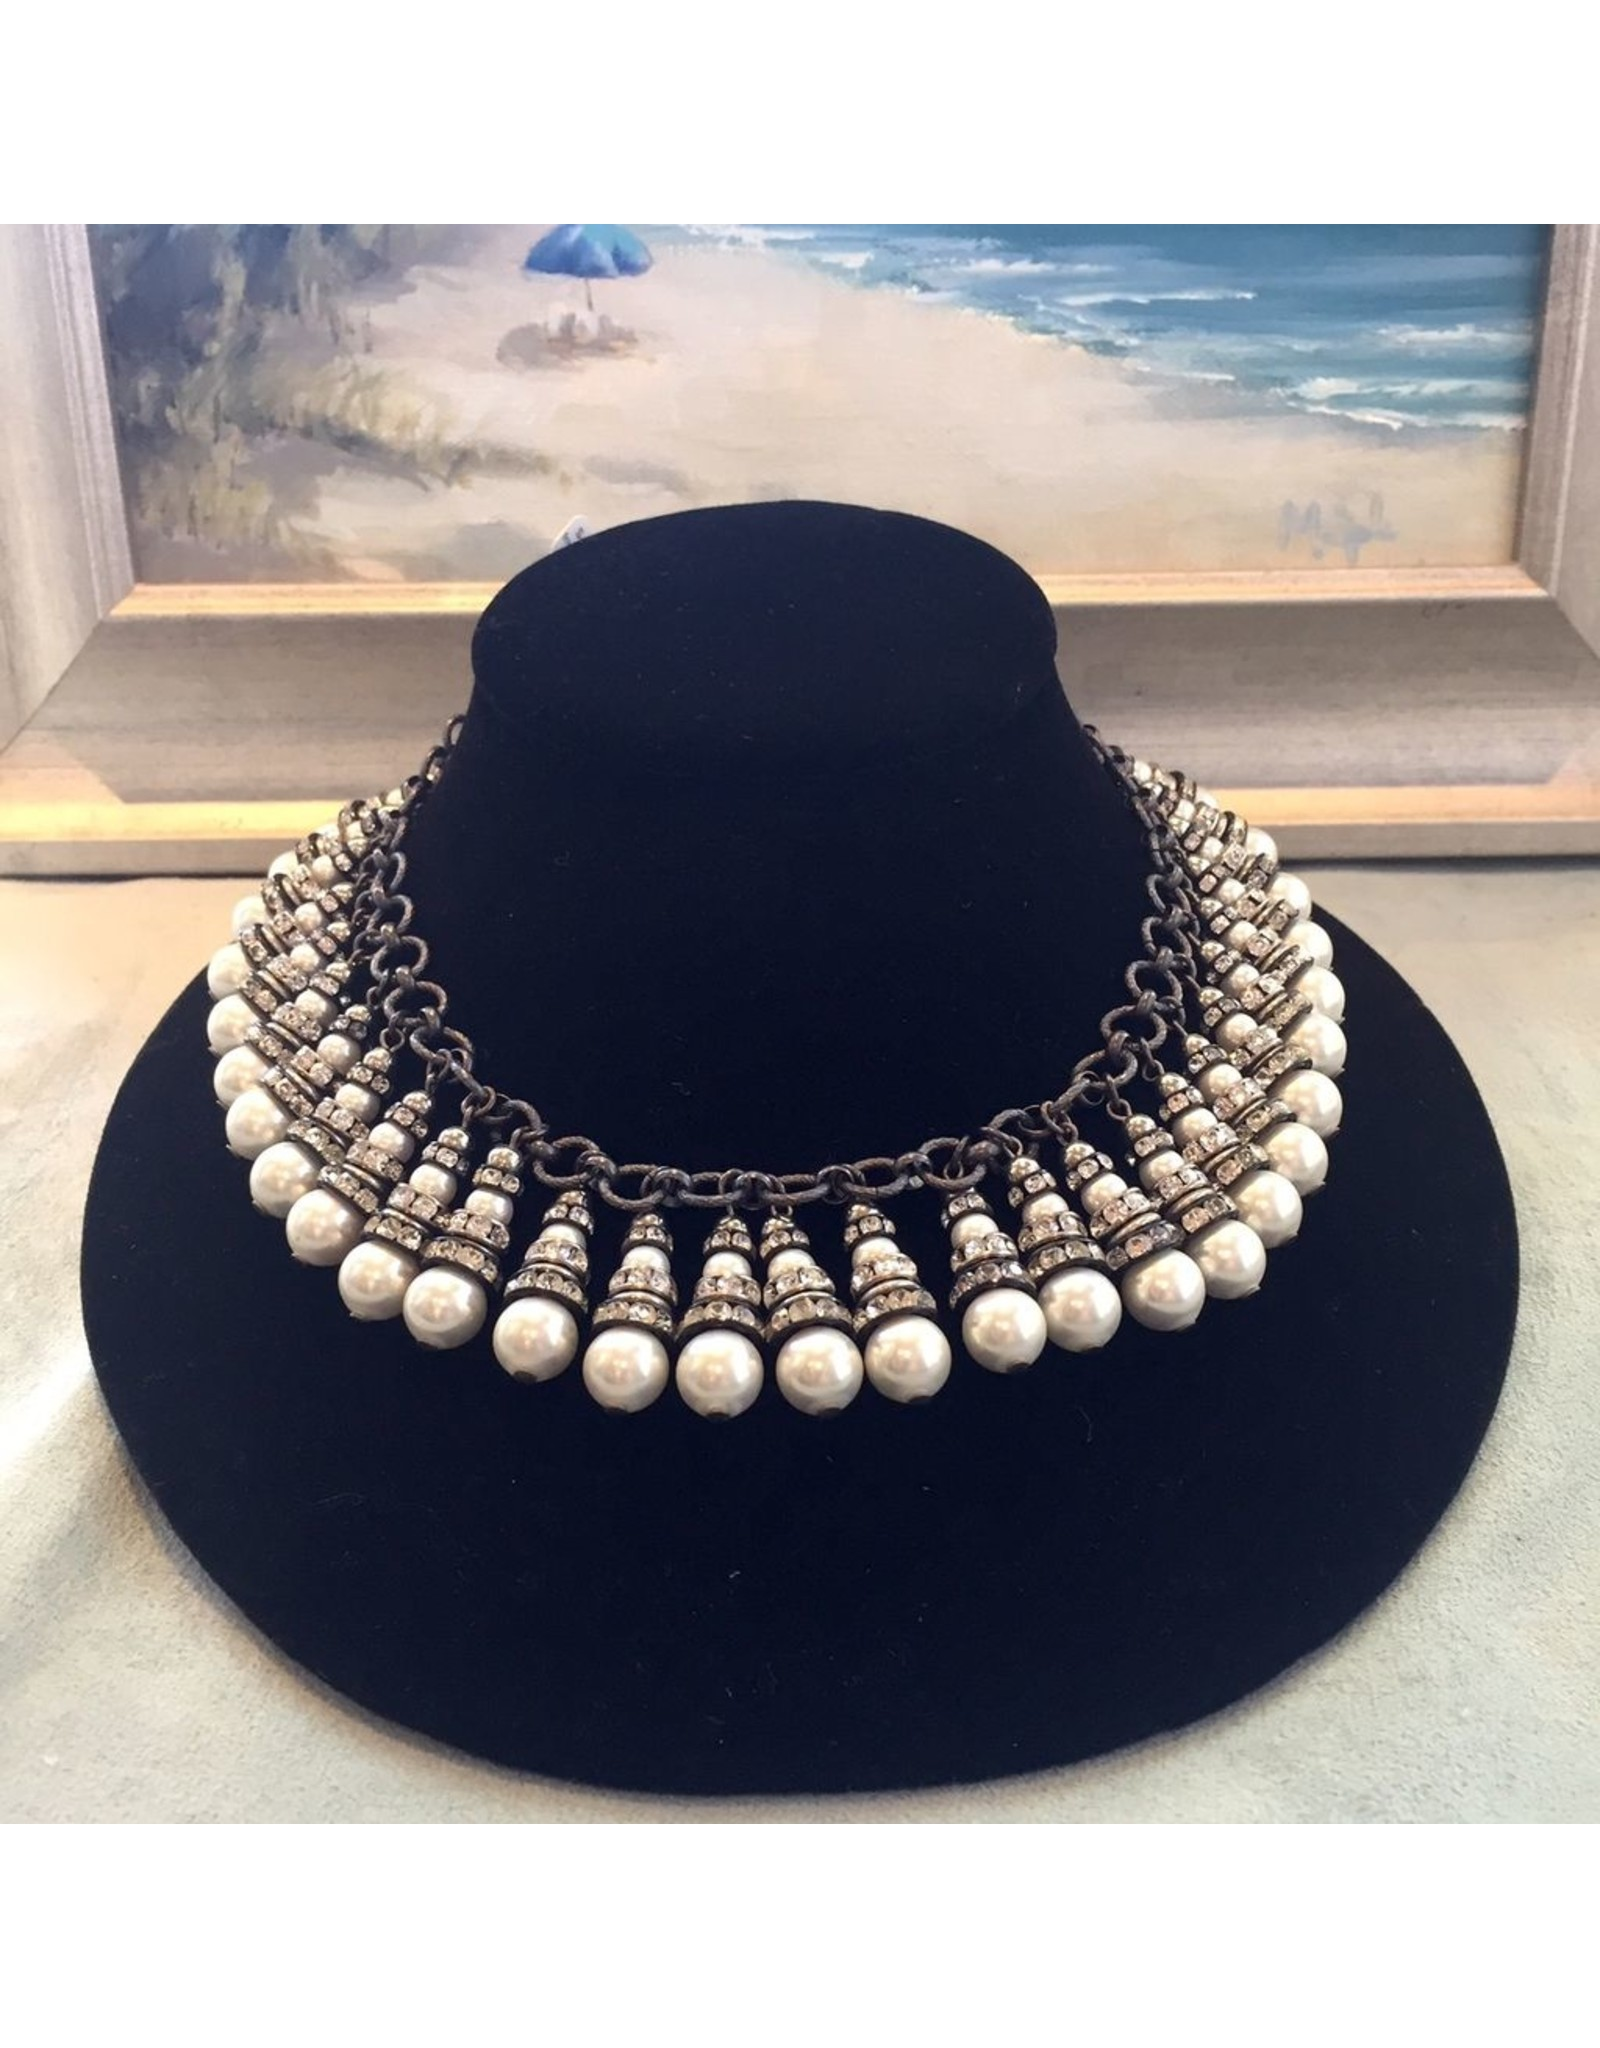 Francoise Montague FMontague: Cherie Droplets in Pearl